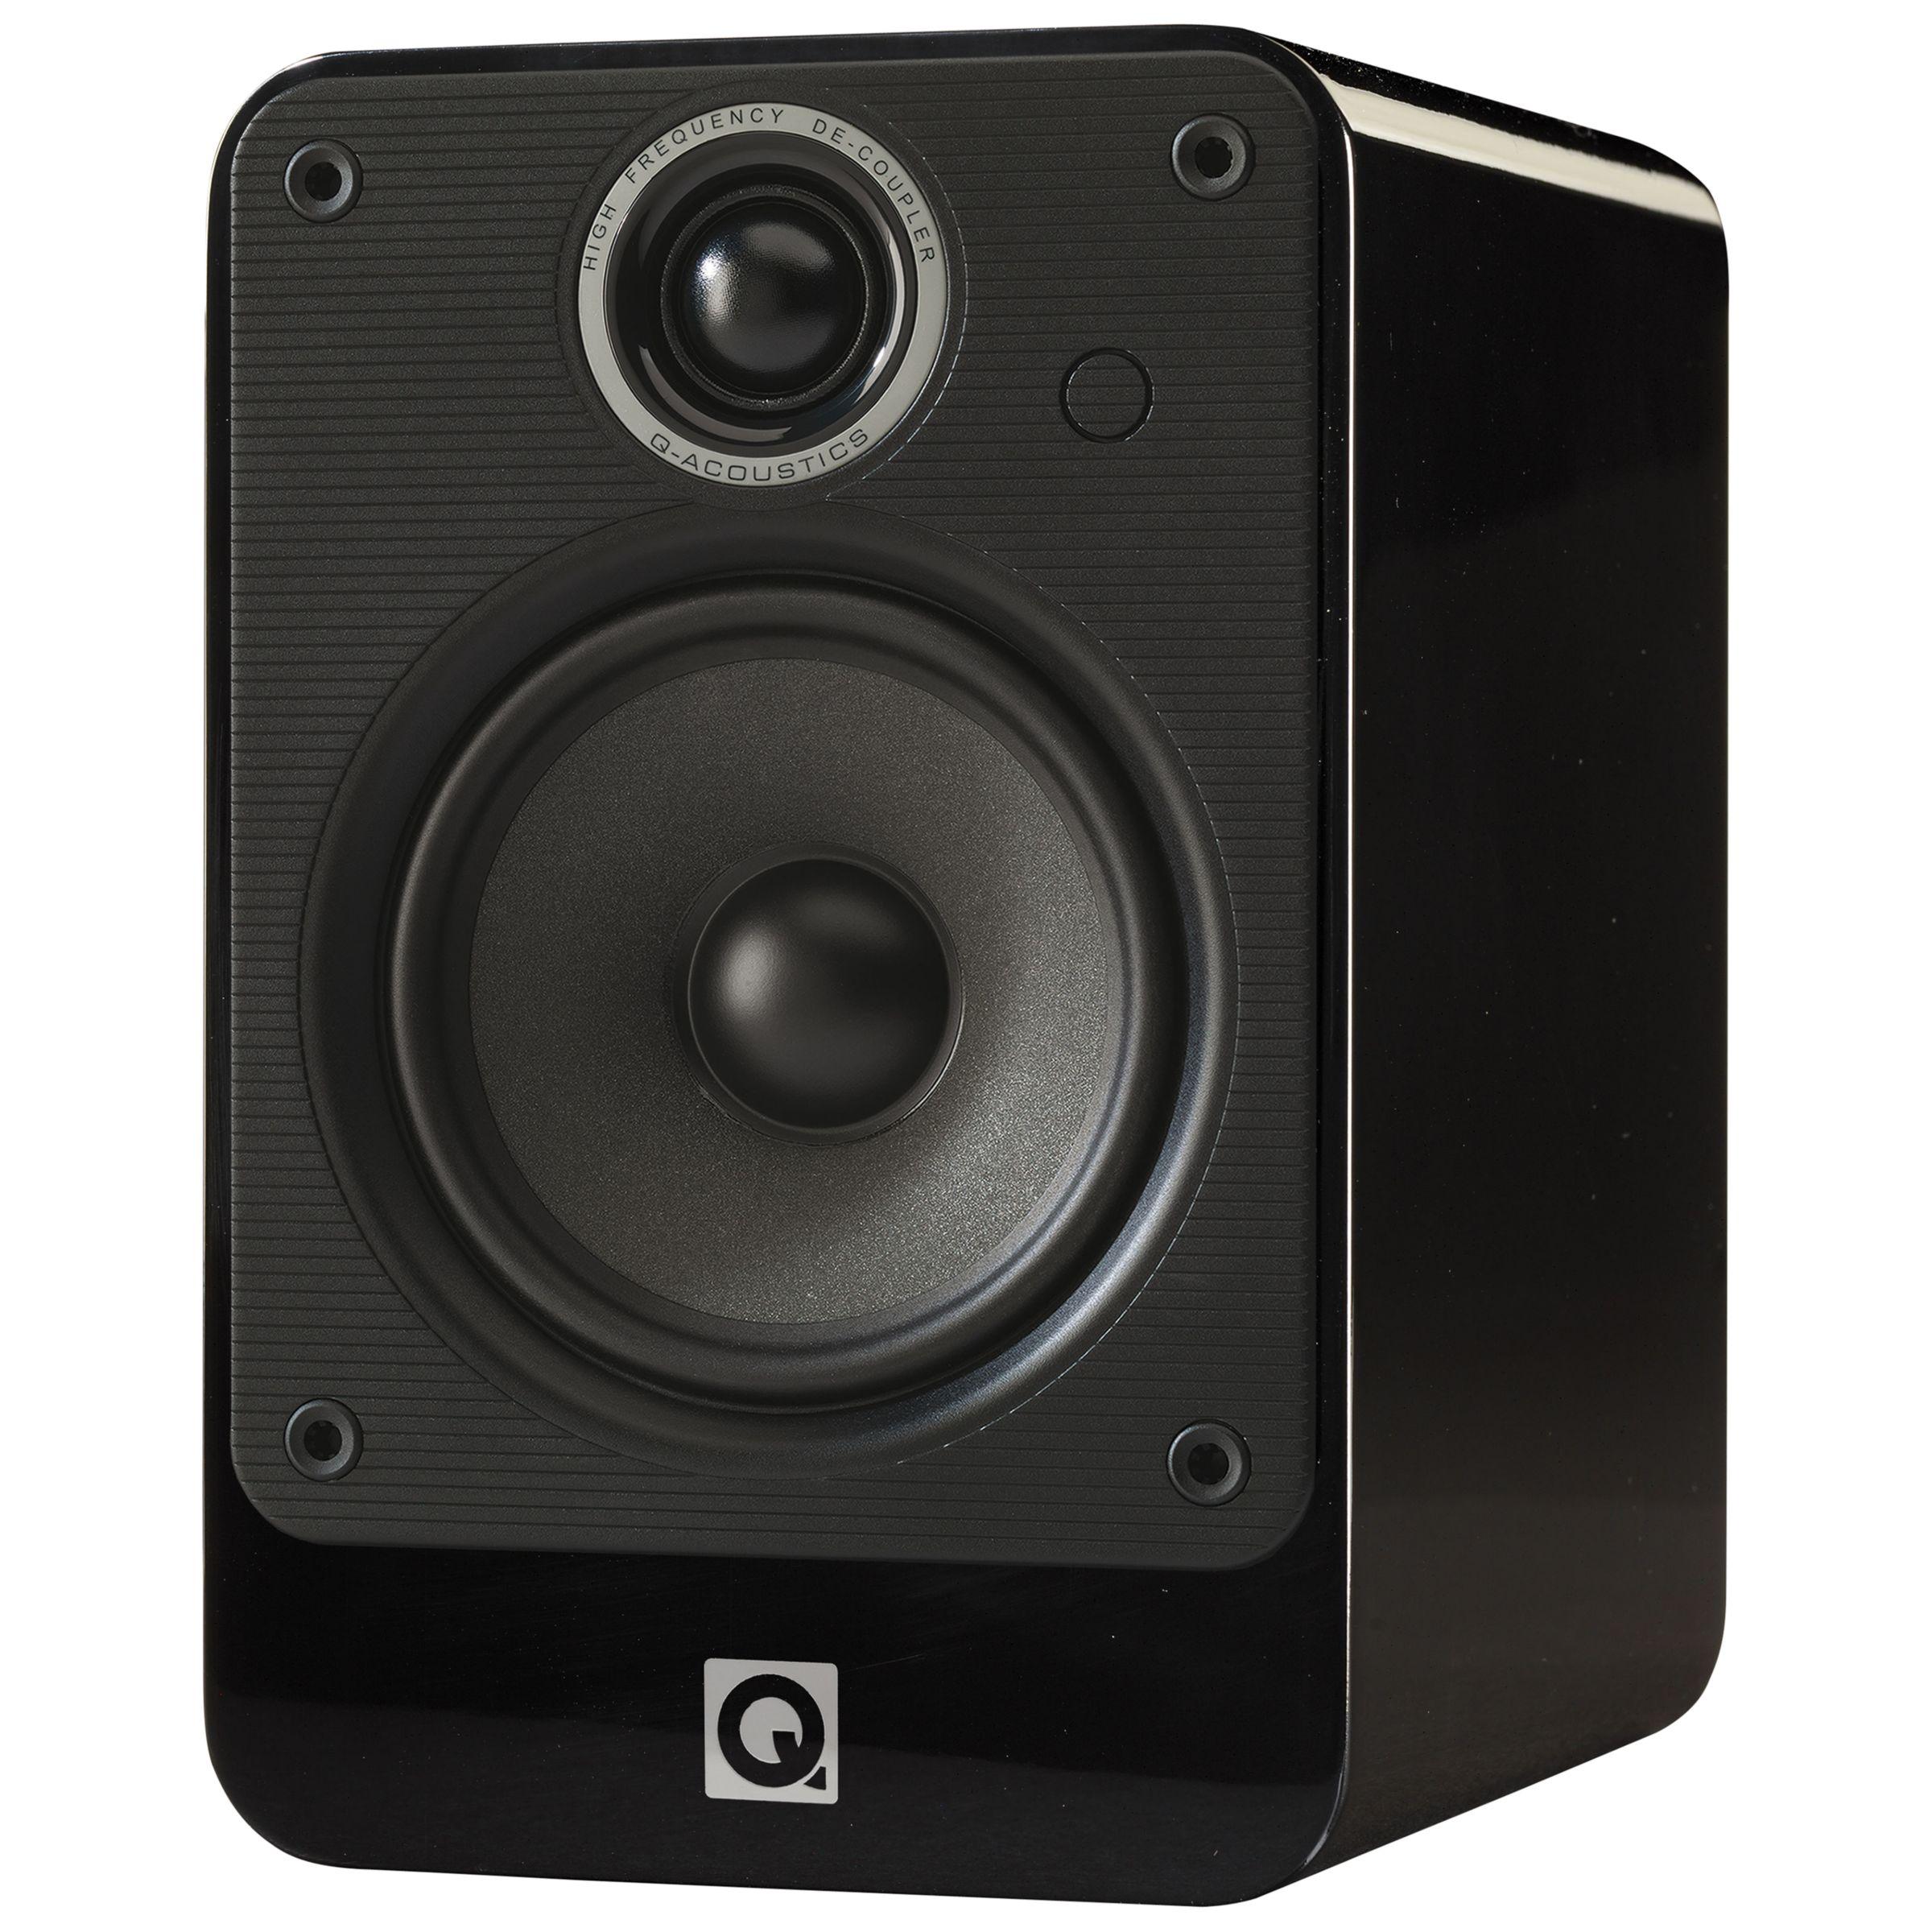 Q Acoustics Q Acoustics 2020i Bookshelf Speakers